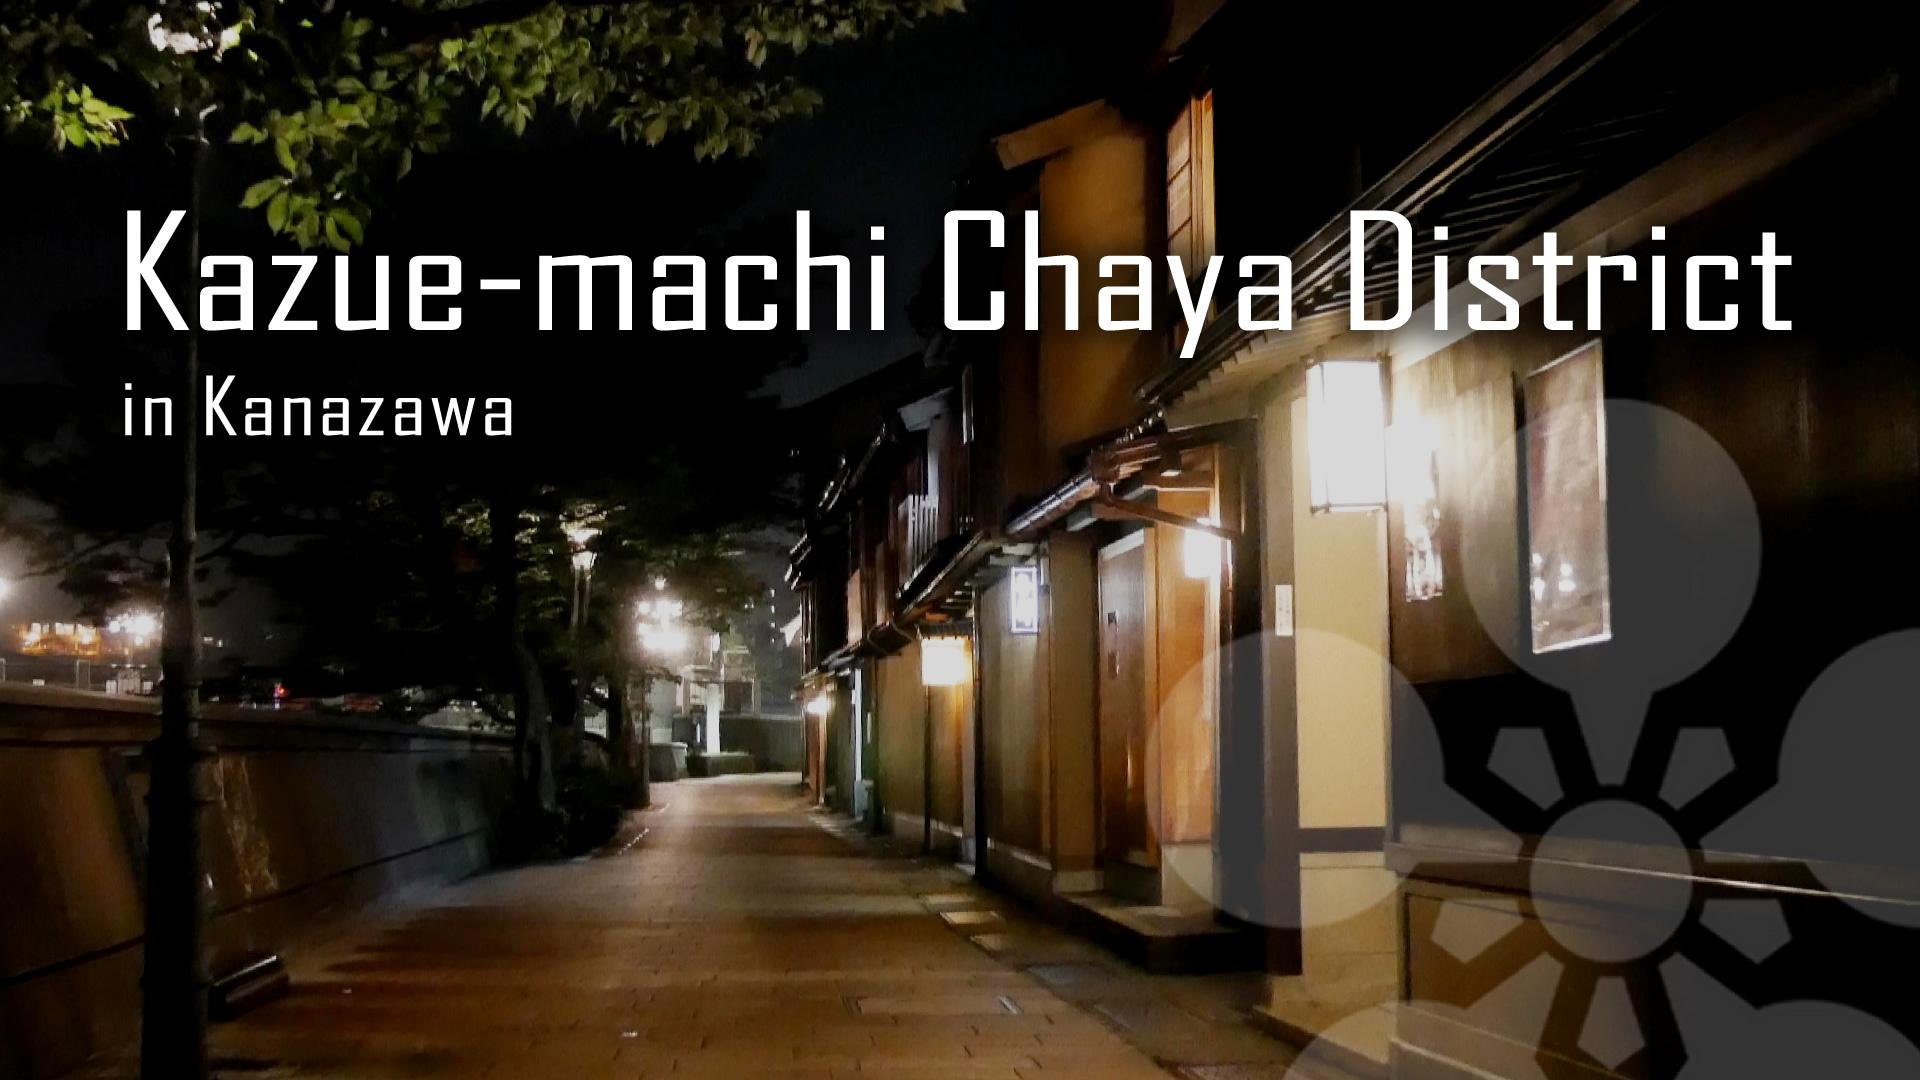 Kuragari-zaka & Akari-zaka at Kazue-machi Chaya District - Kanazawa Slops